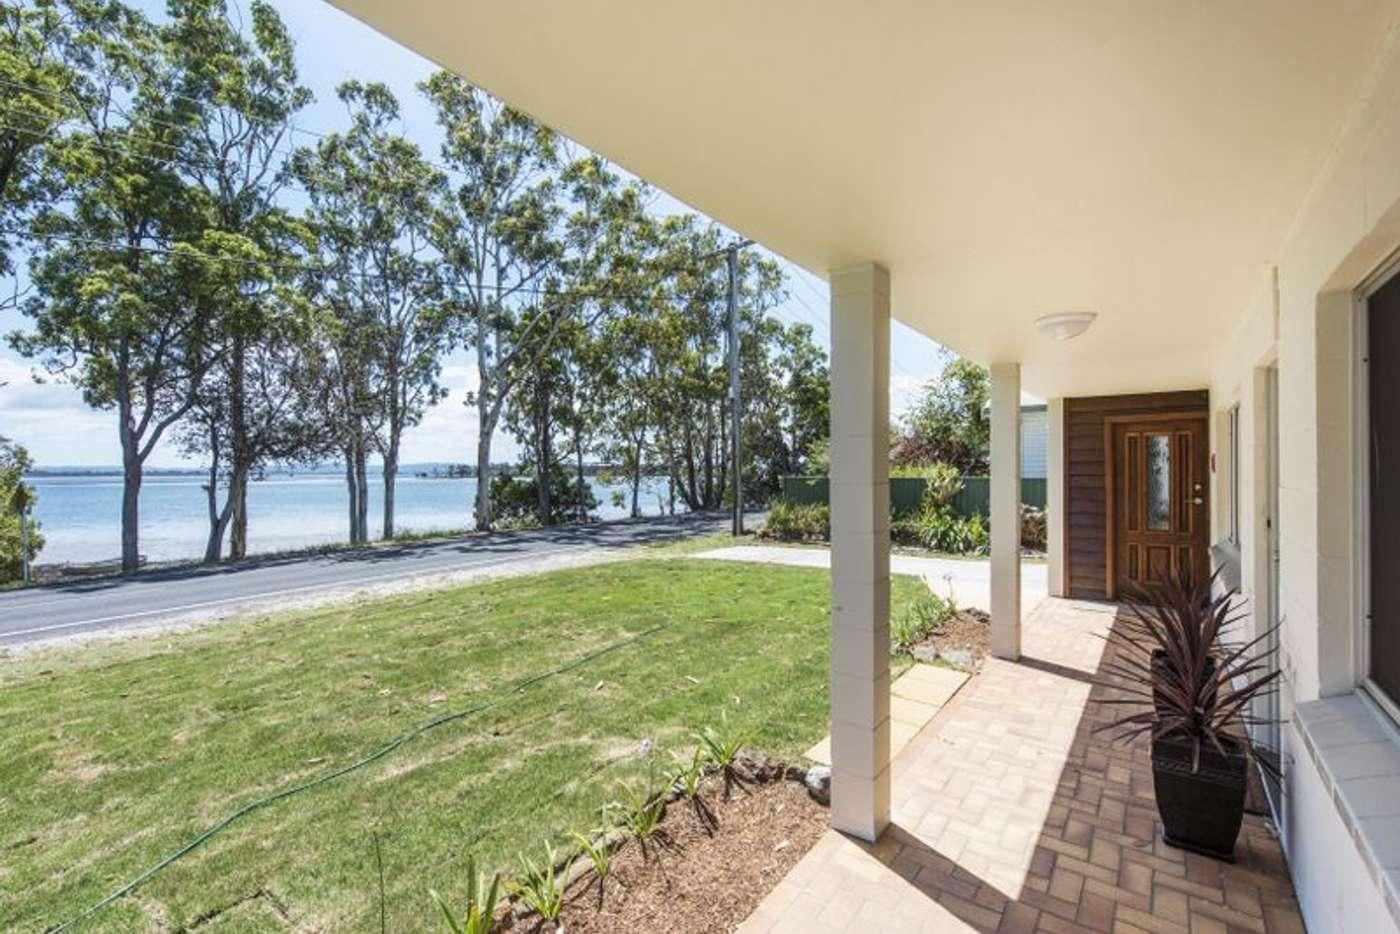 Main view of Homely house listing, 3B Duke Street, Iluka NSW 2466